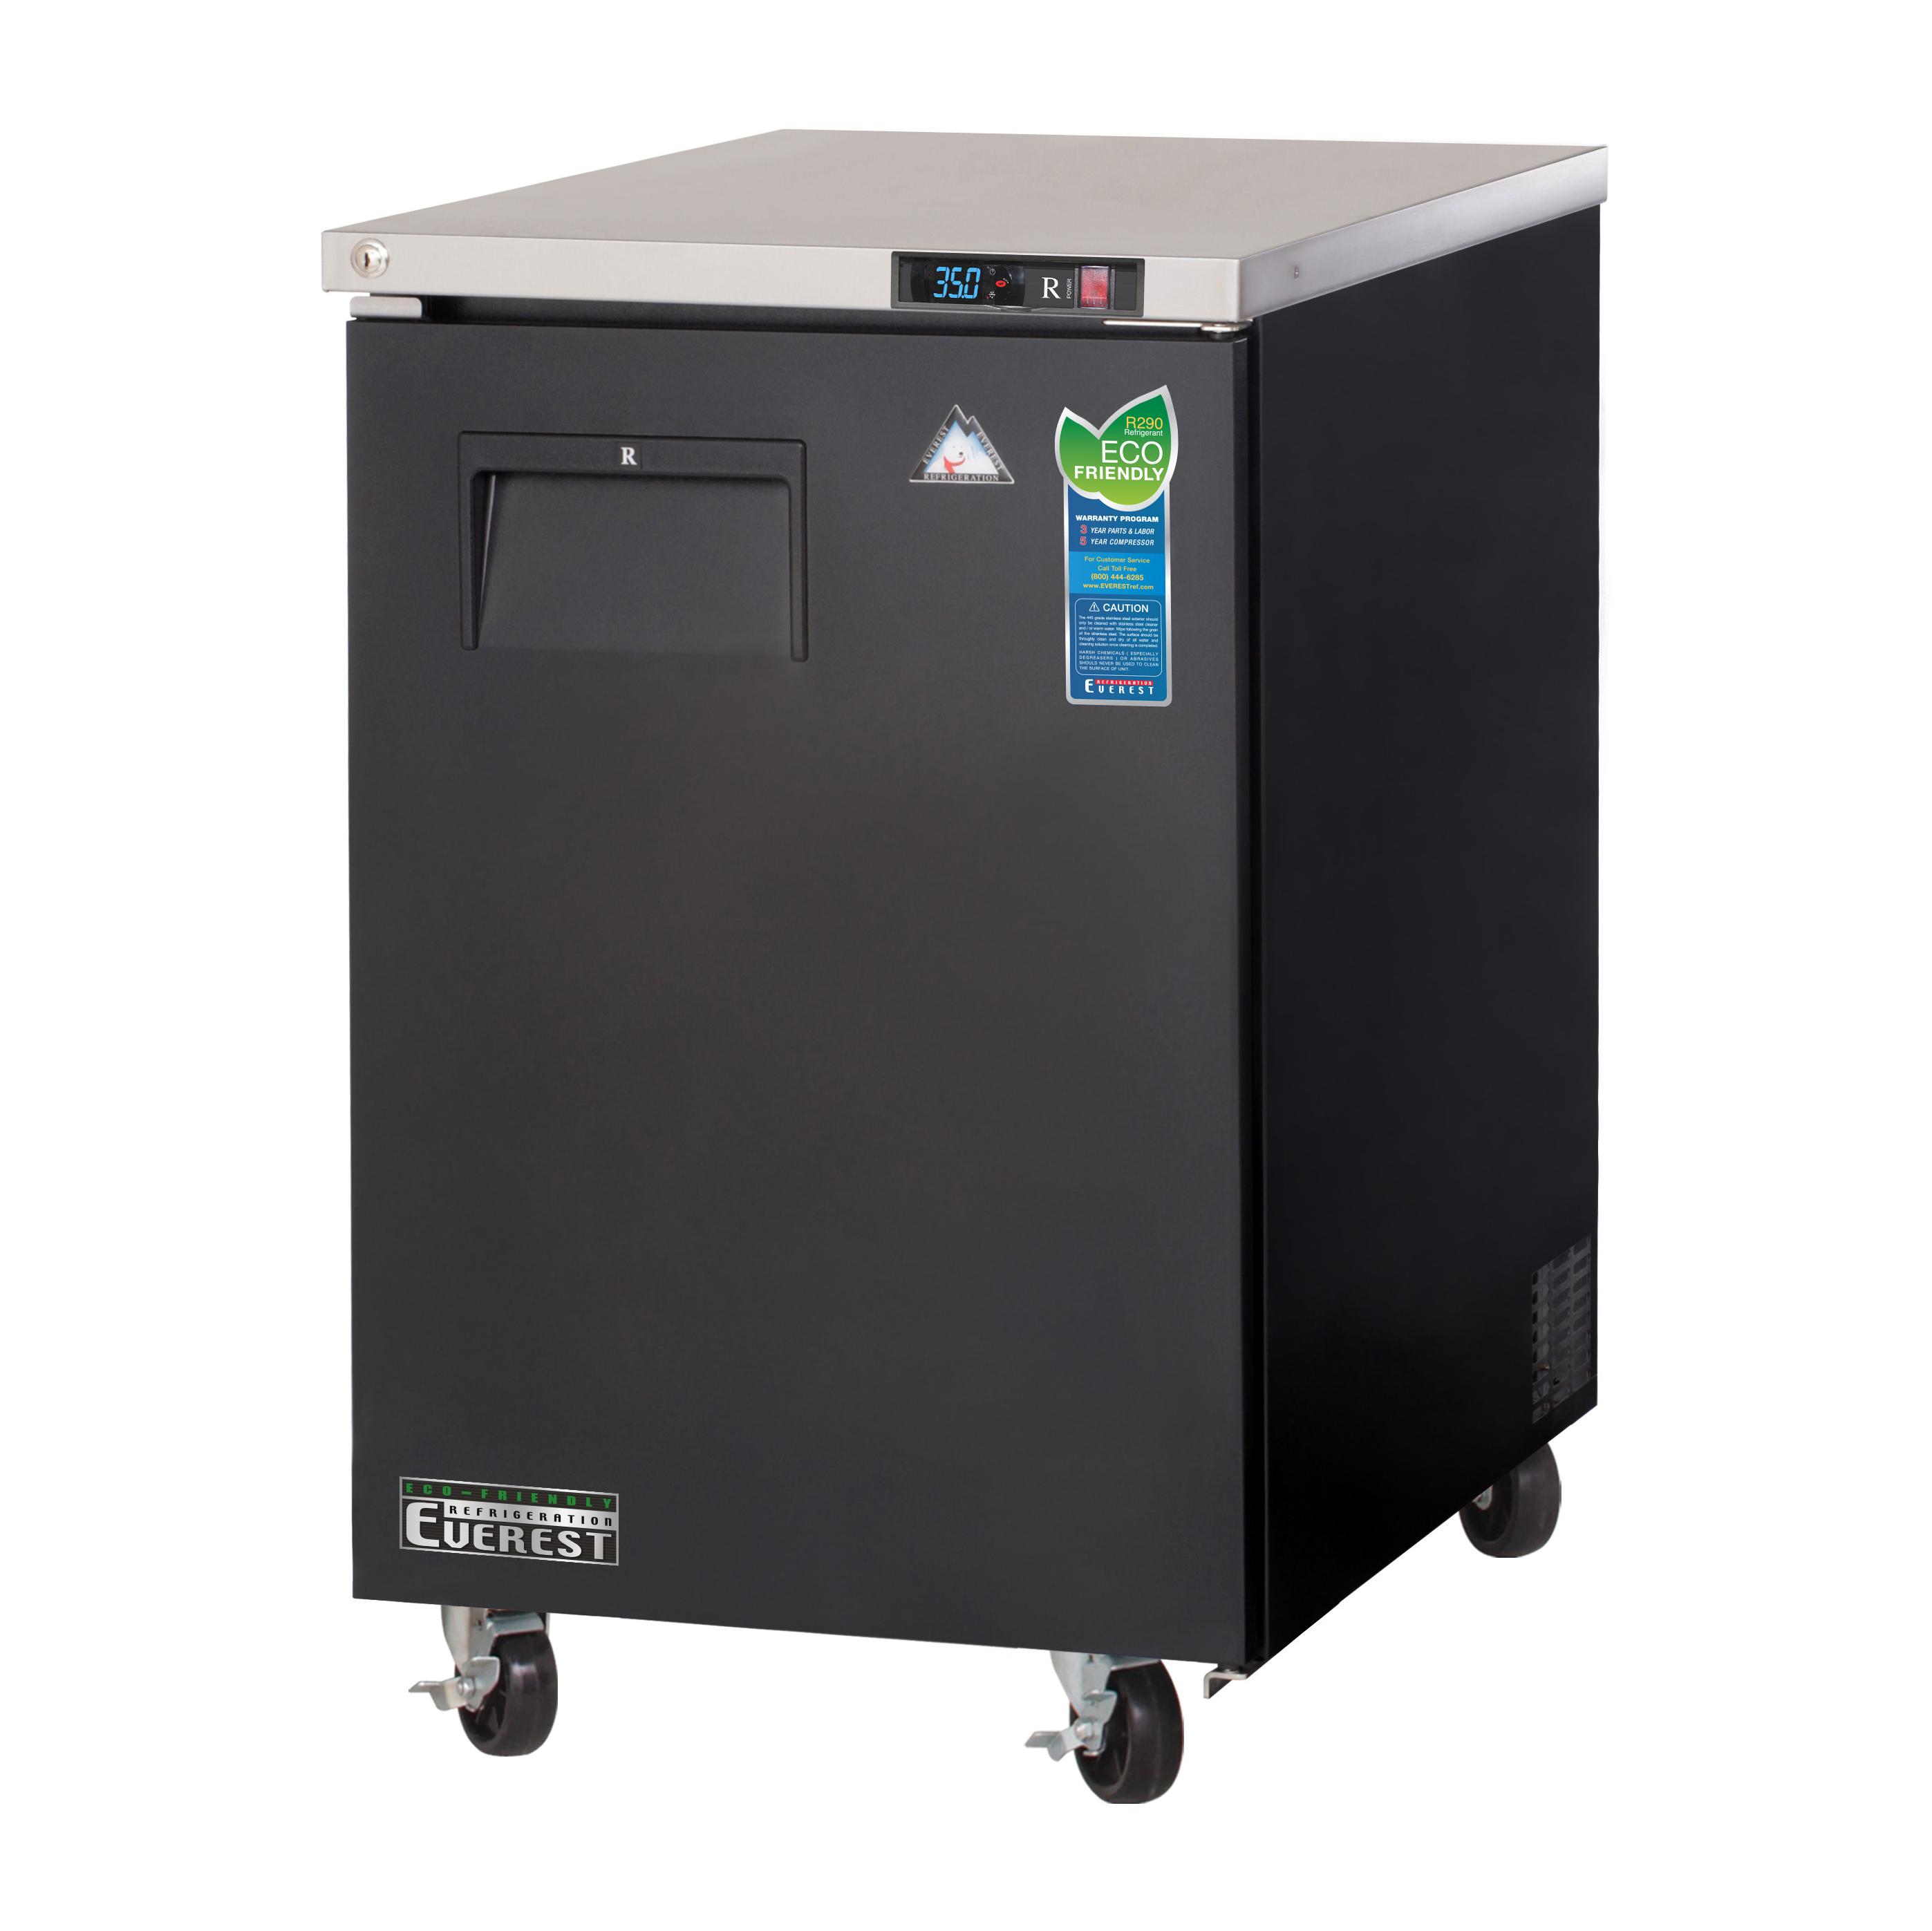 Everest Refrigeration EBB23 back bar cabinet, refrigerated